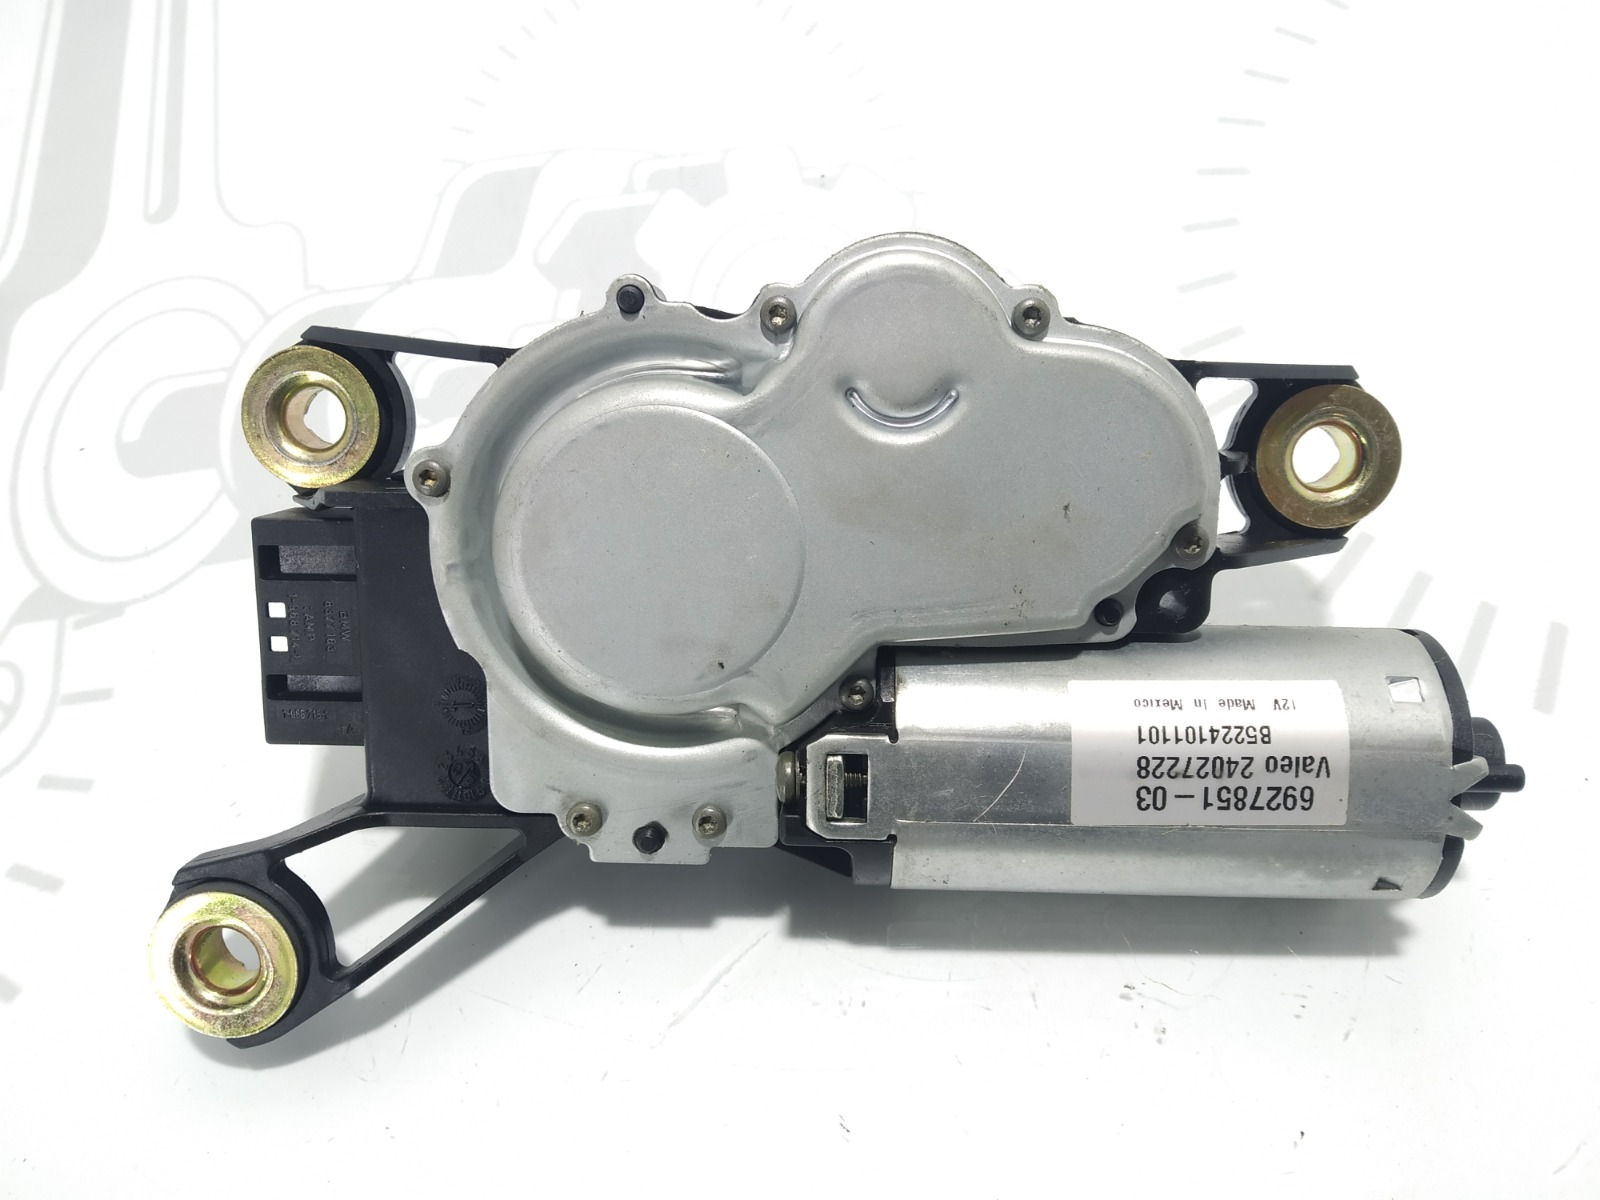 Моторчик заднего стеклоочистителя (дворника) Bmw X5 E53 4.8 I 2005 (б/у)